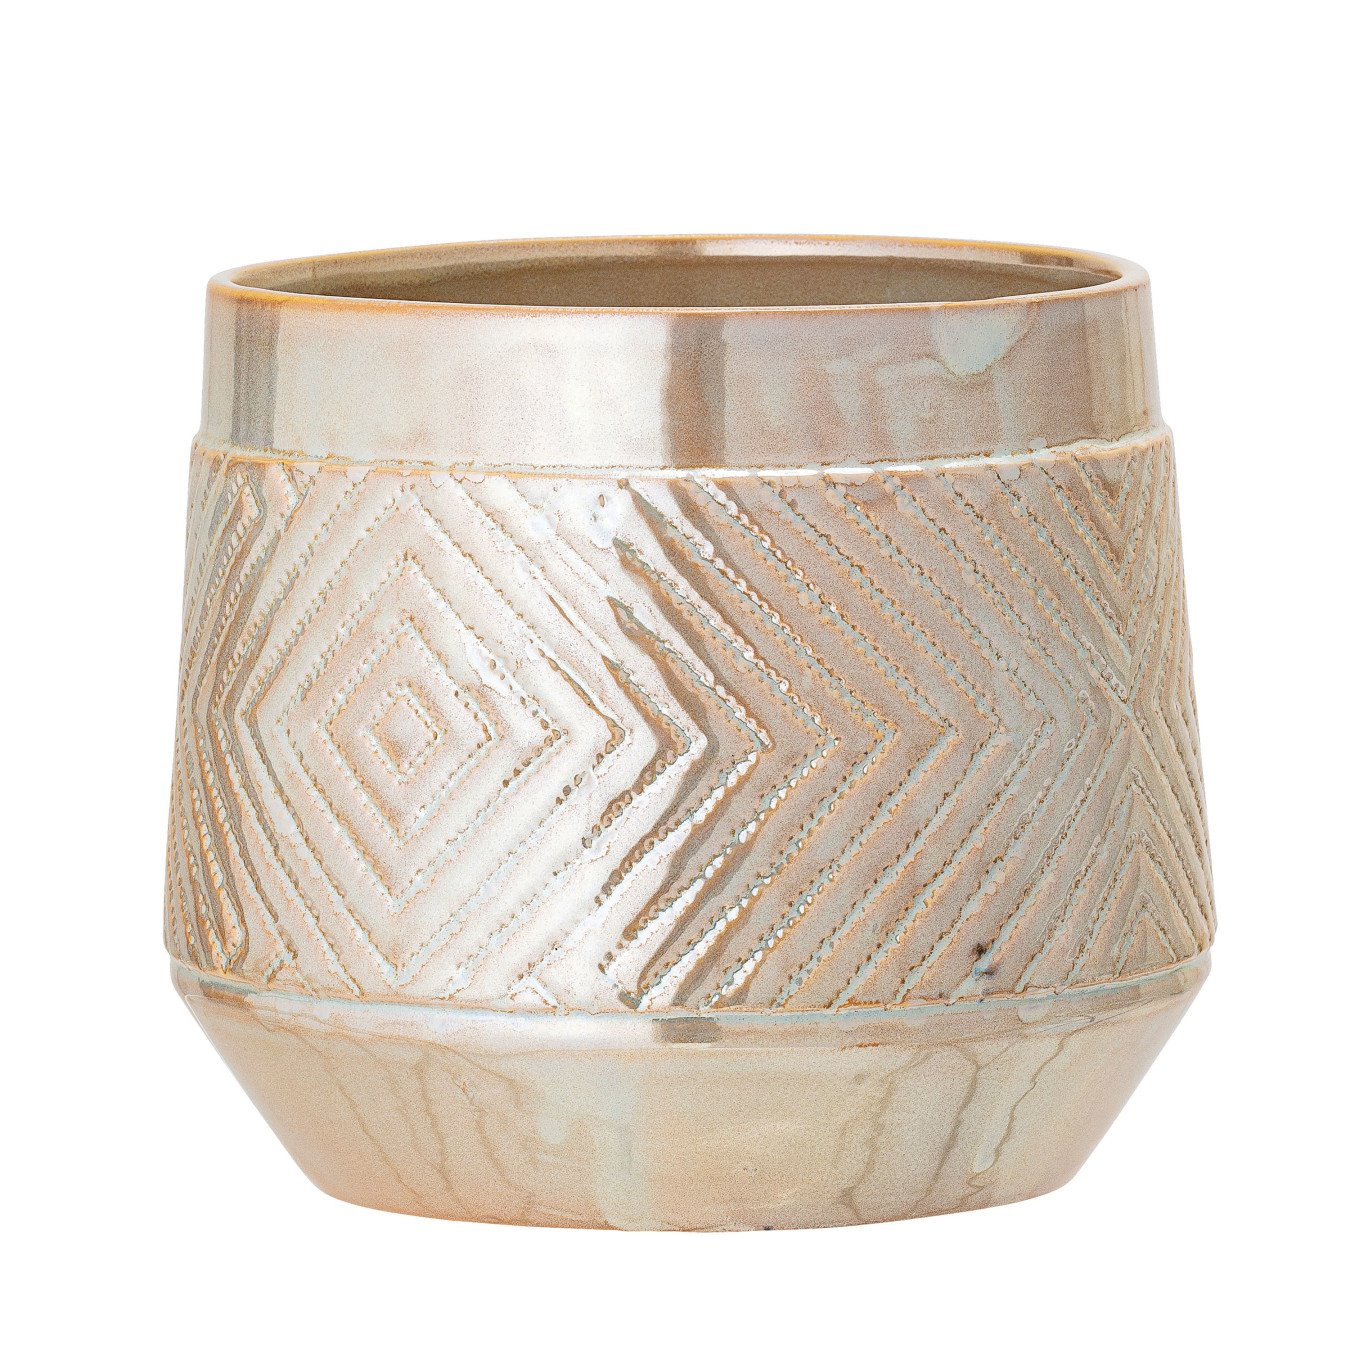 Large Pearlized Stoneware Flower Pot